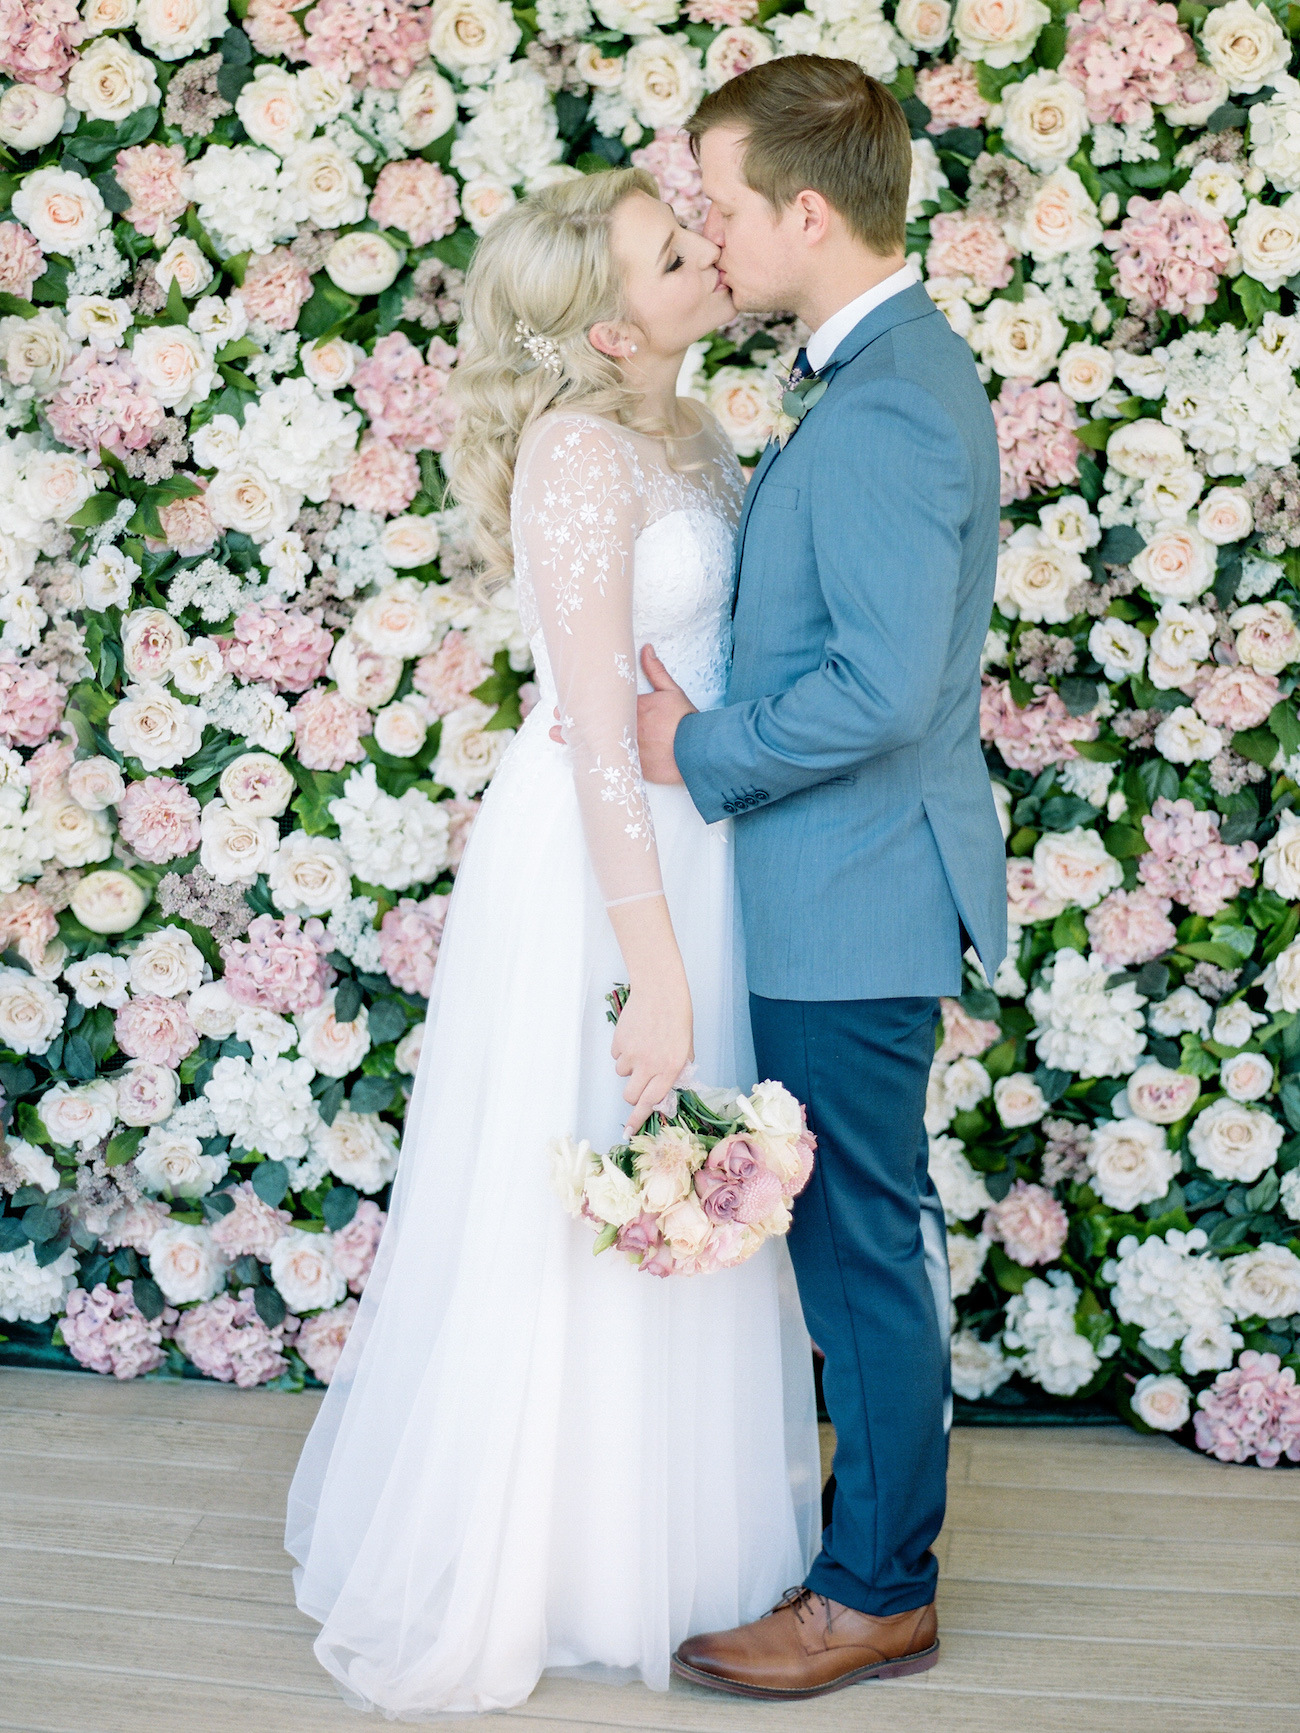 Pink Cream and White Flower Wall | Image: Rensche Mari